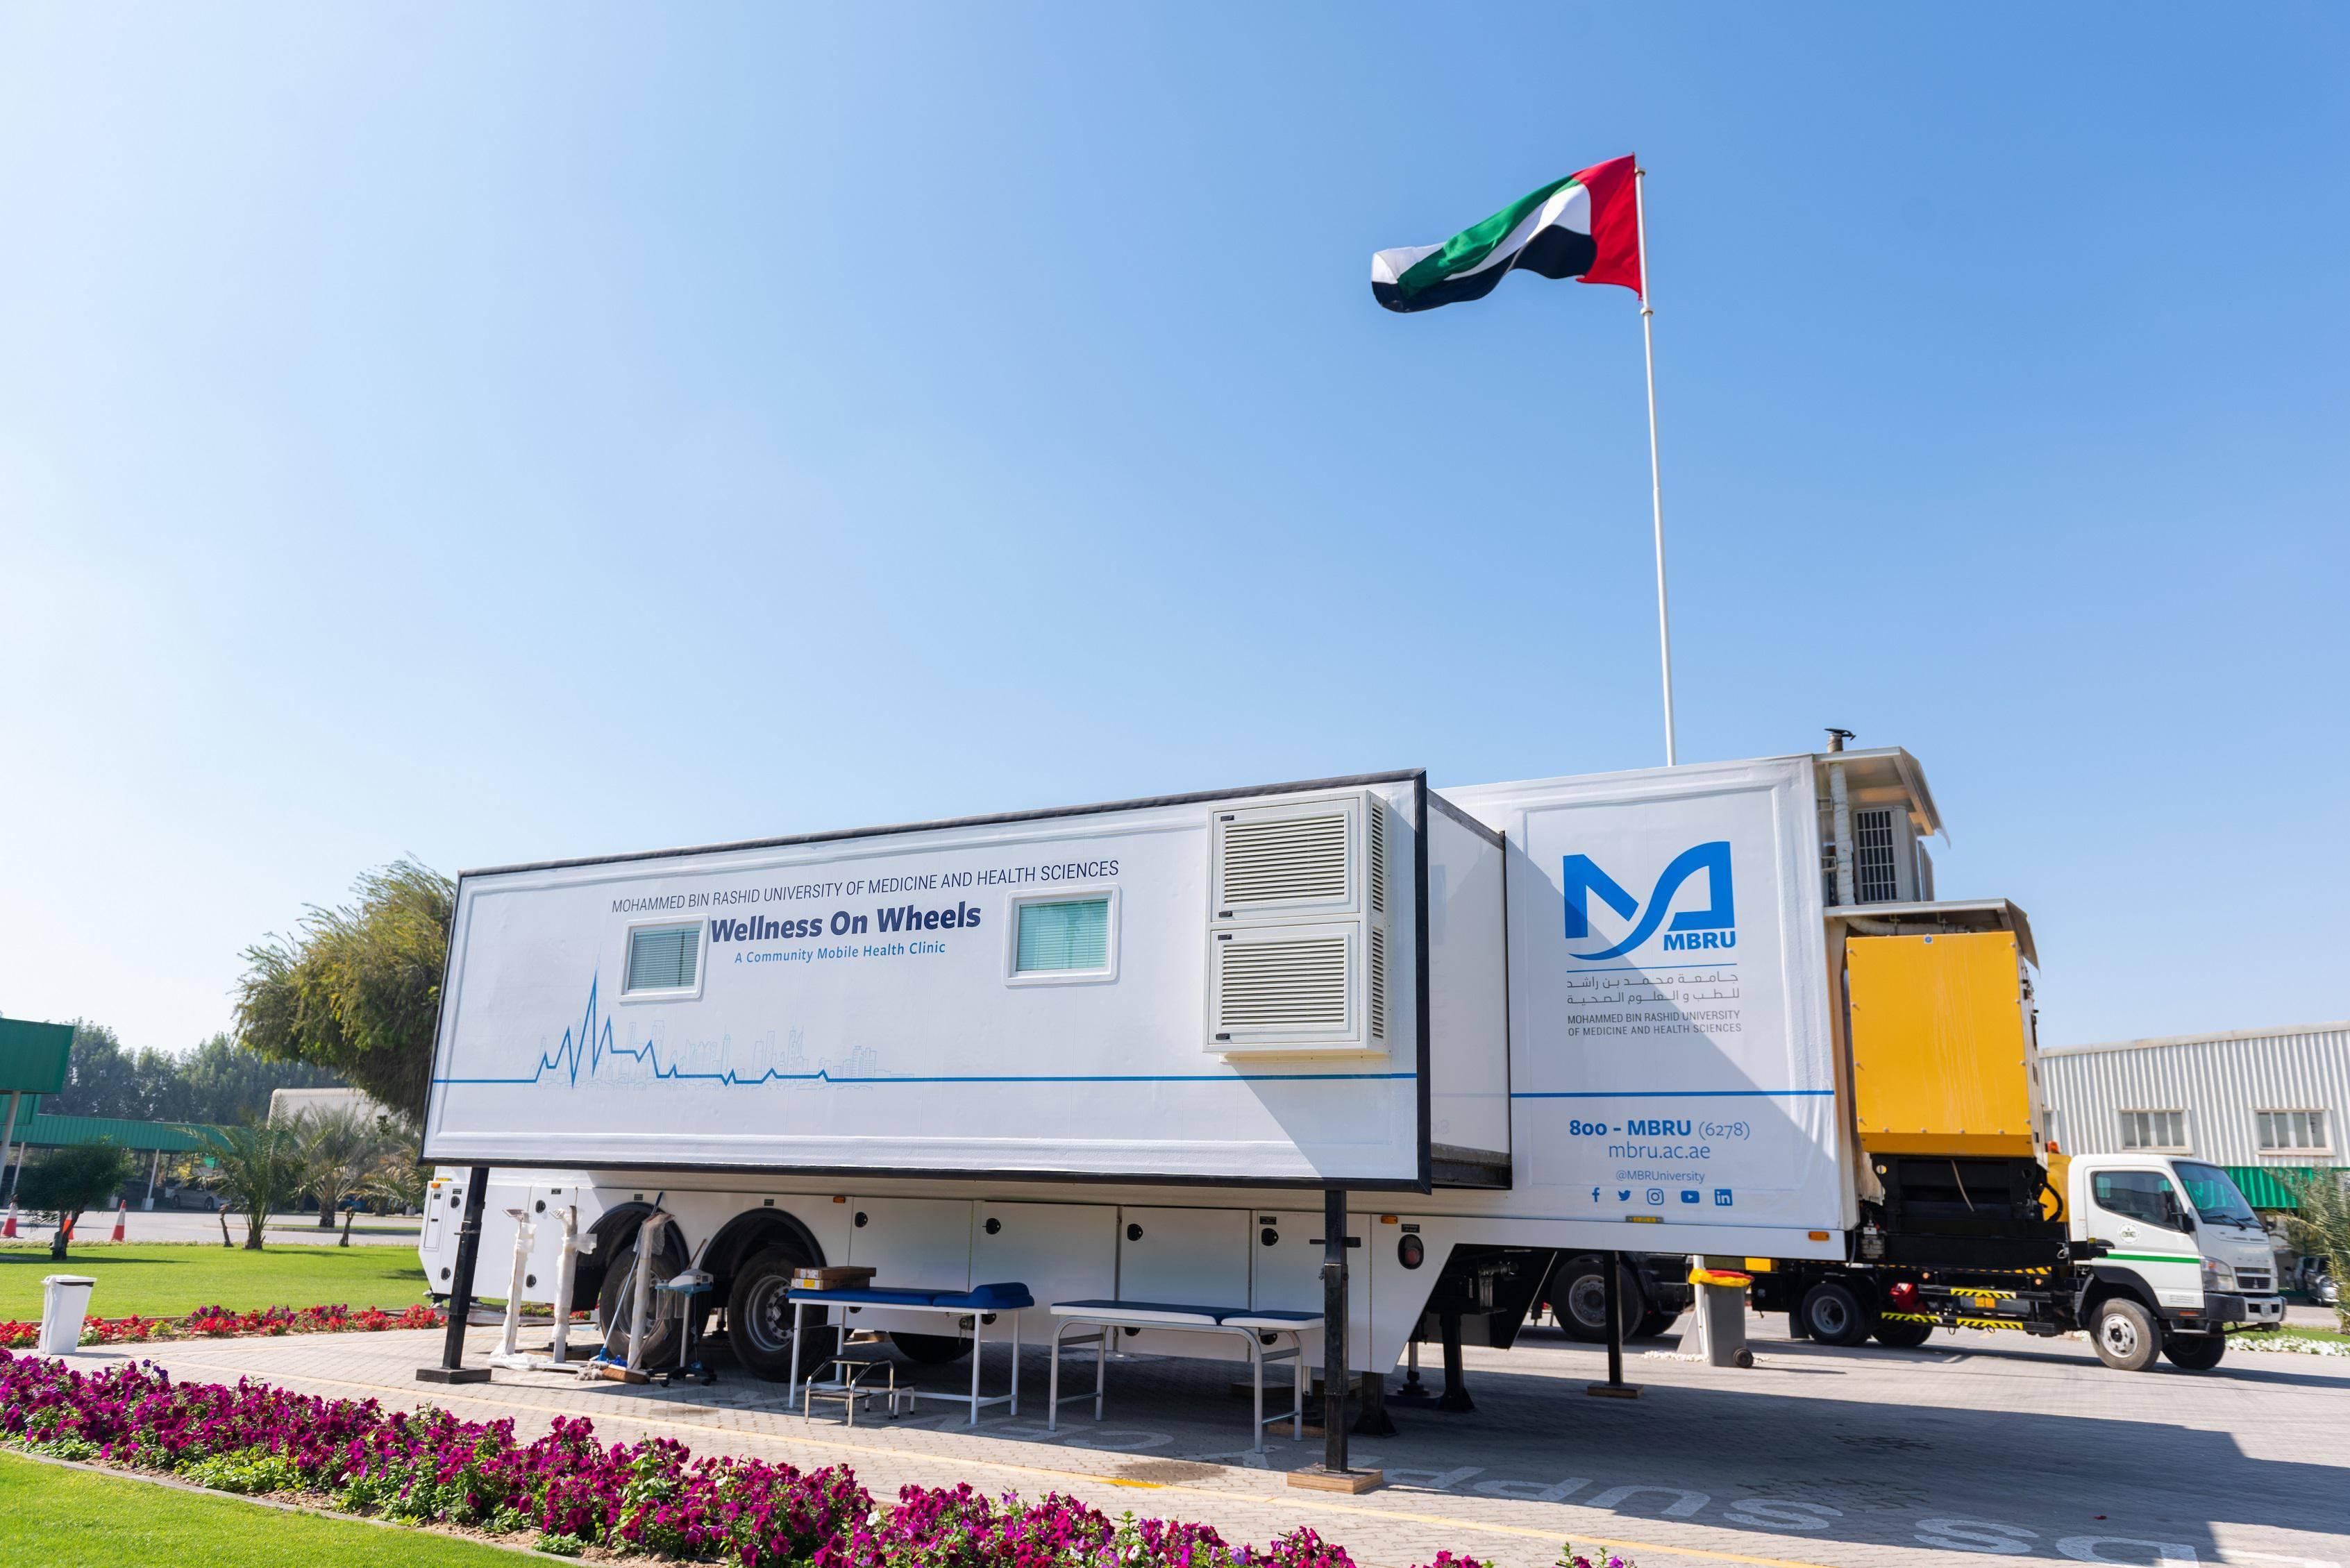 Video: Dubai rolls out Covid-19 vaccine clinics on wheels